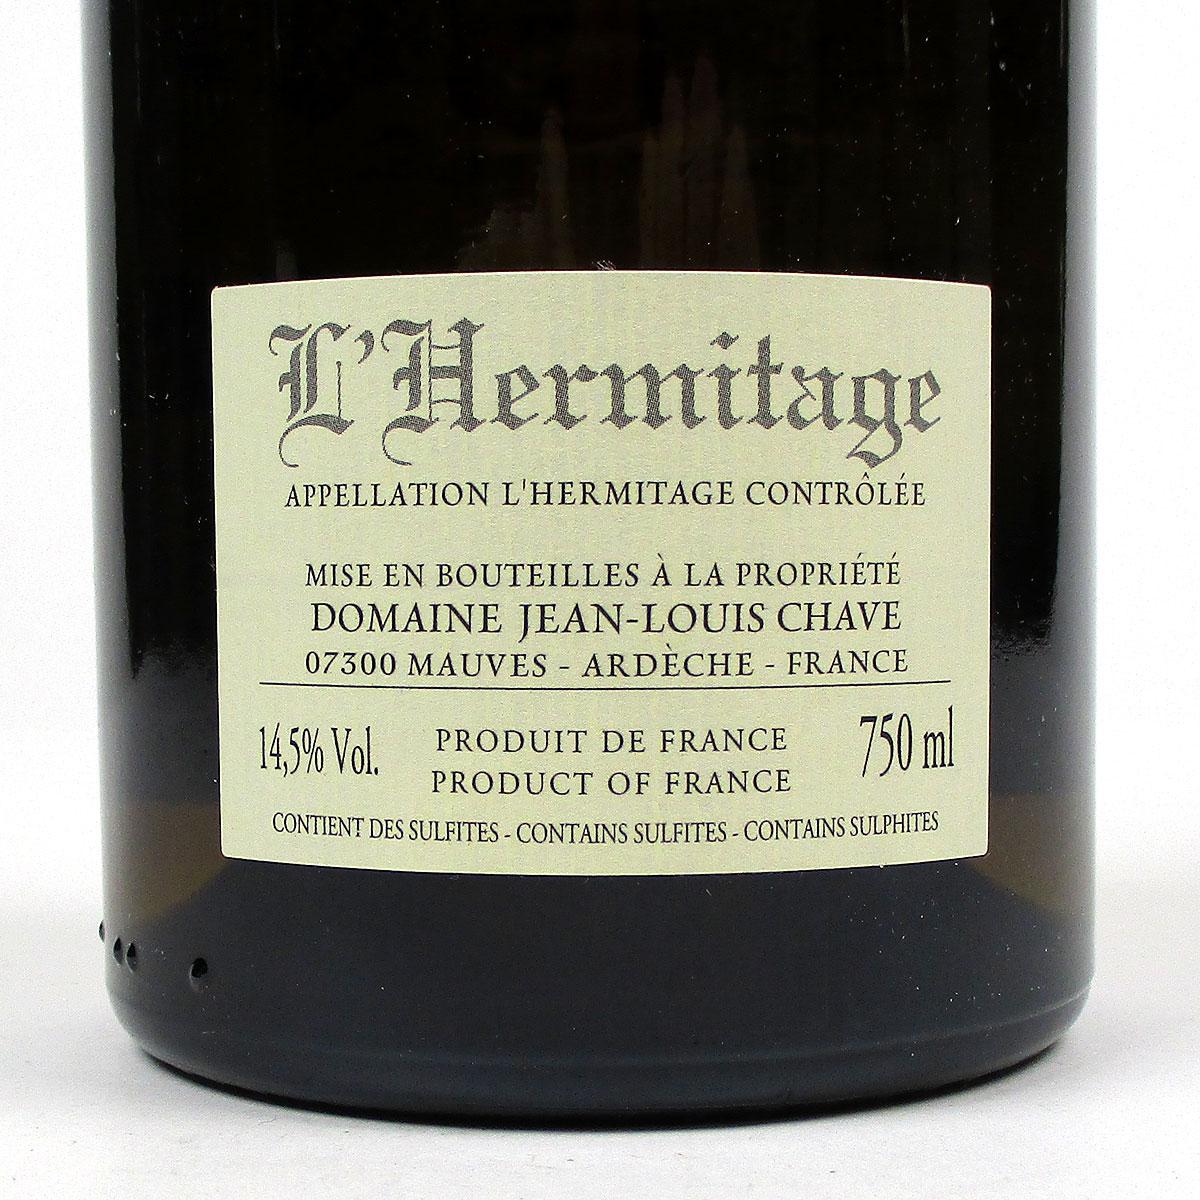 Hermitage: Jean-Louis Chave Blanc 2014 - Bottle Rear Label